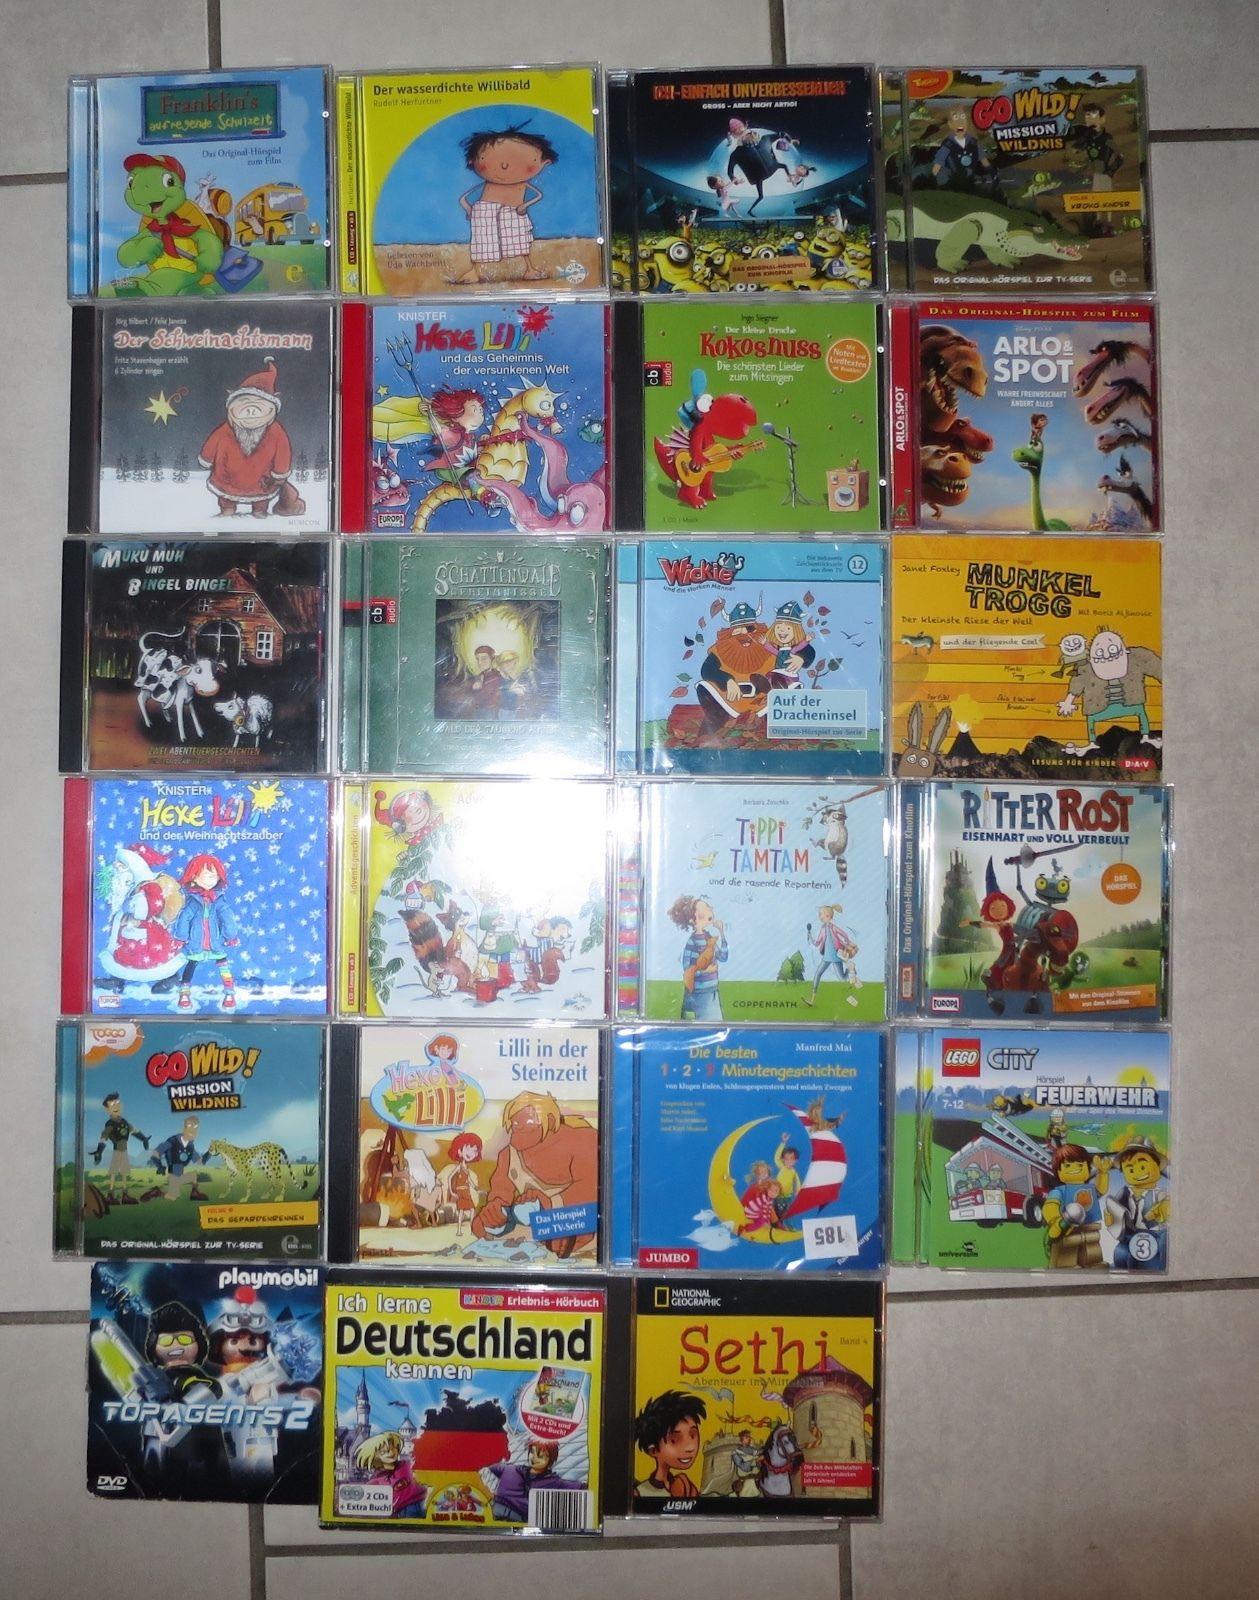 Jako-O CD-Paket Hörspiel Kinder 23 Stck. Drache Kokosnuss,Hexe Lilli,Ich-Einfach